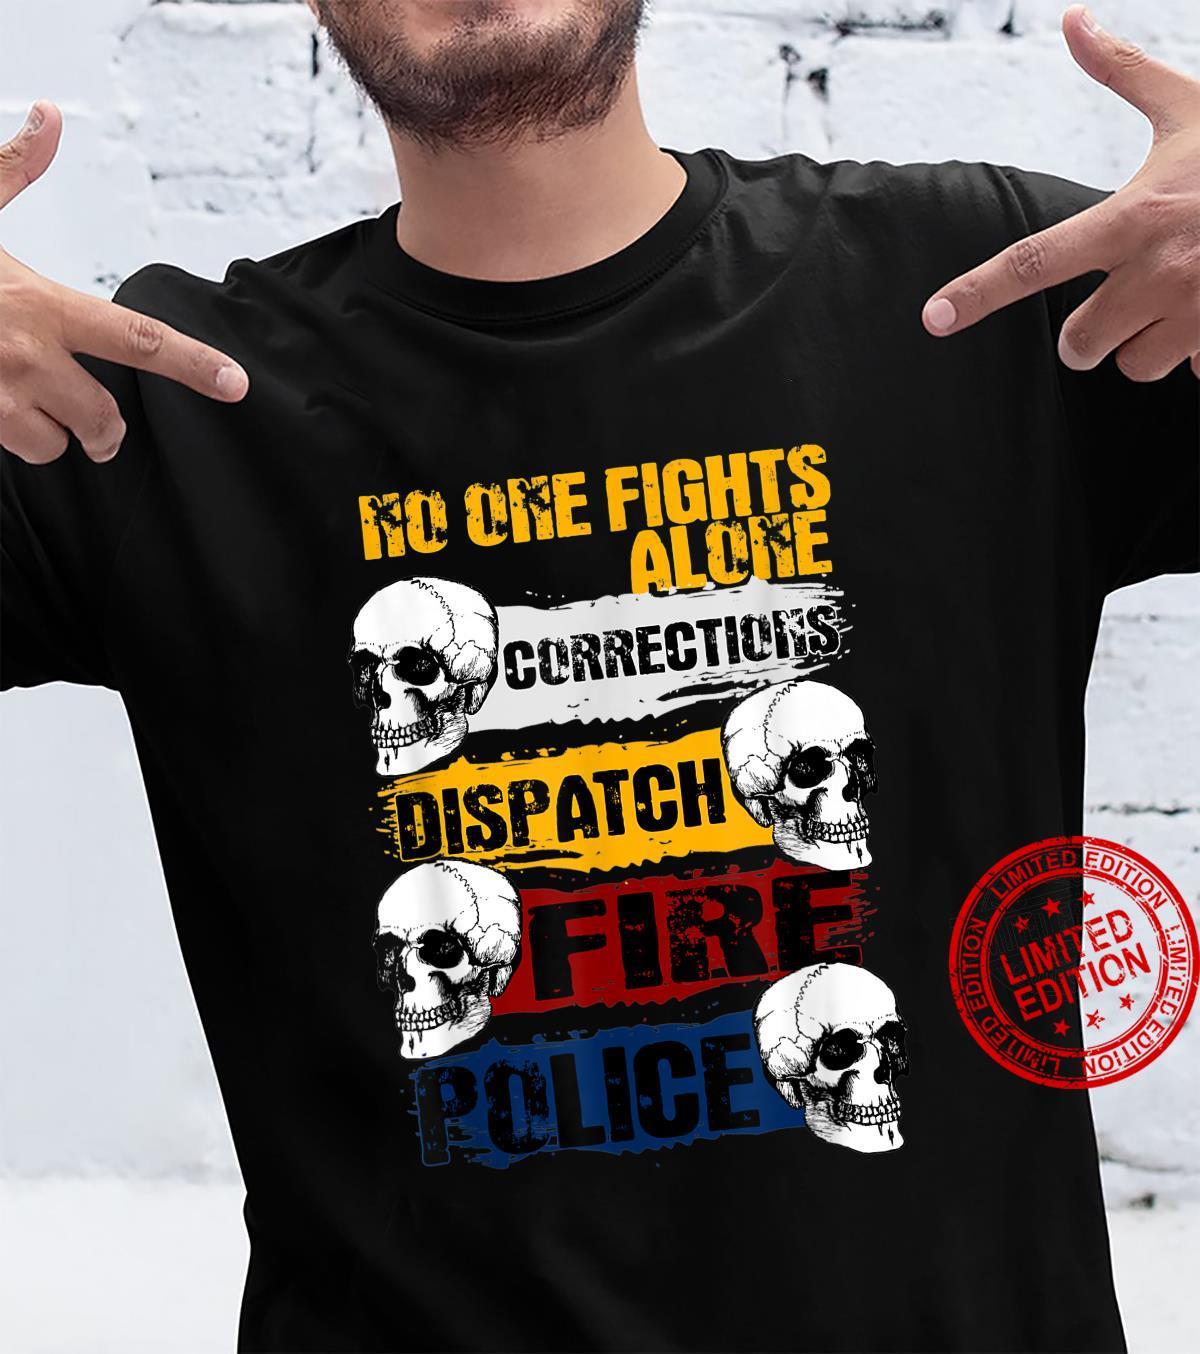 Ersthelfer Thin Line Heroes amerikanische Flagge Shirt